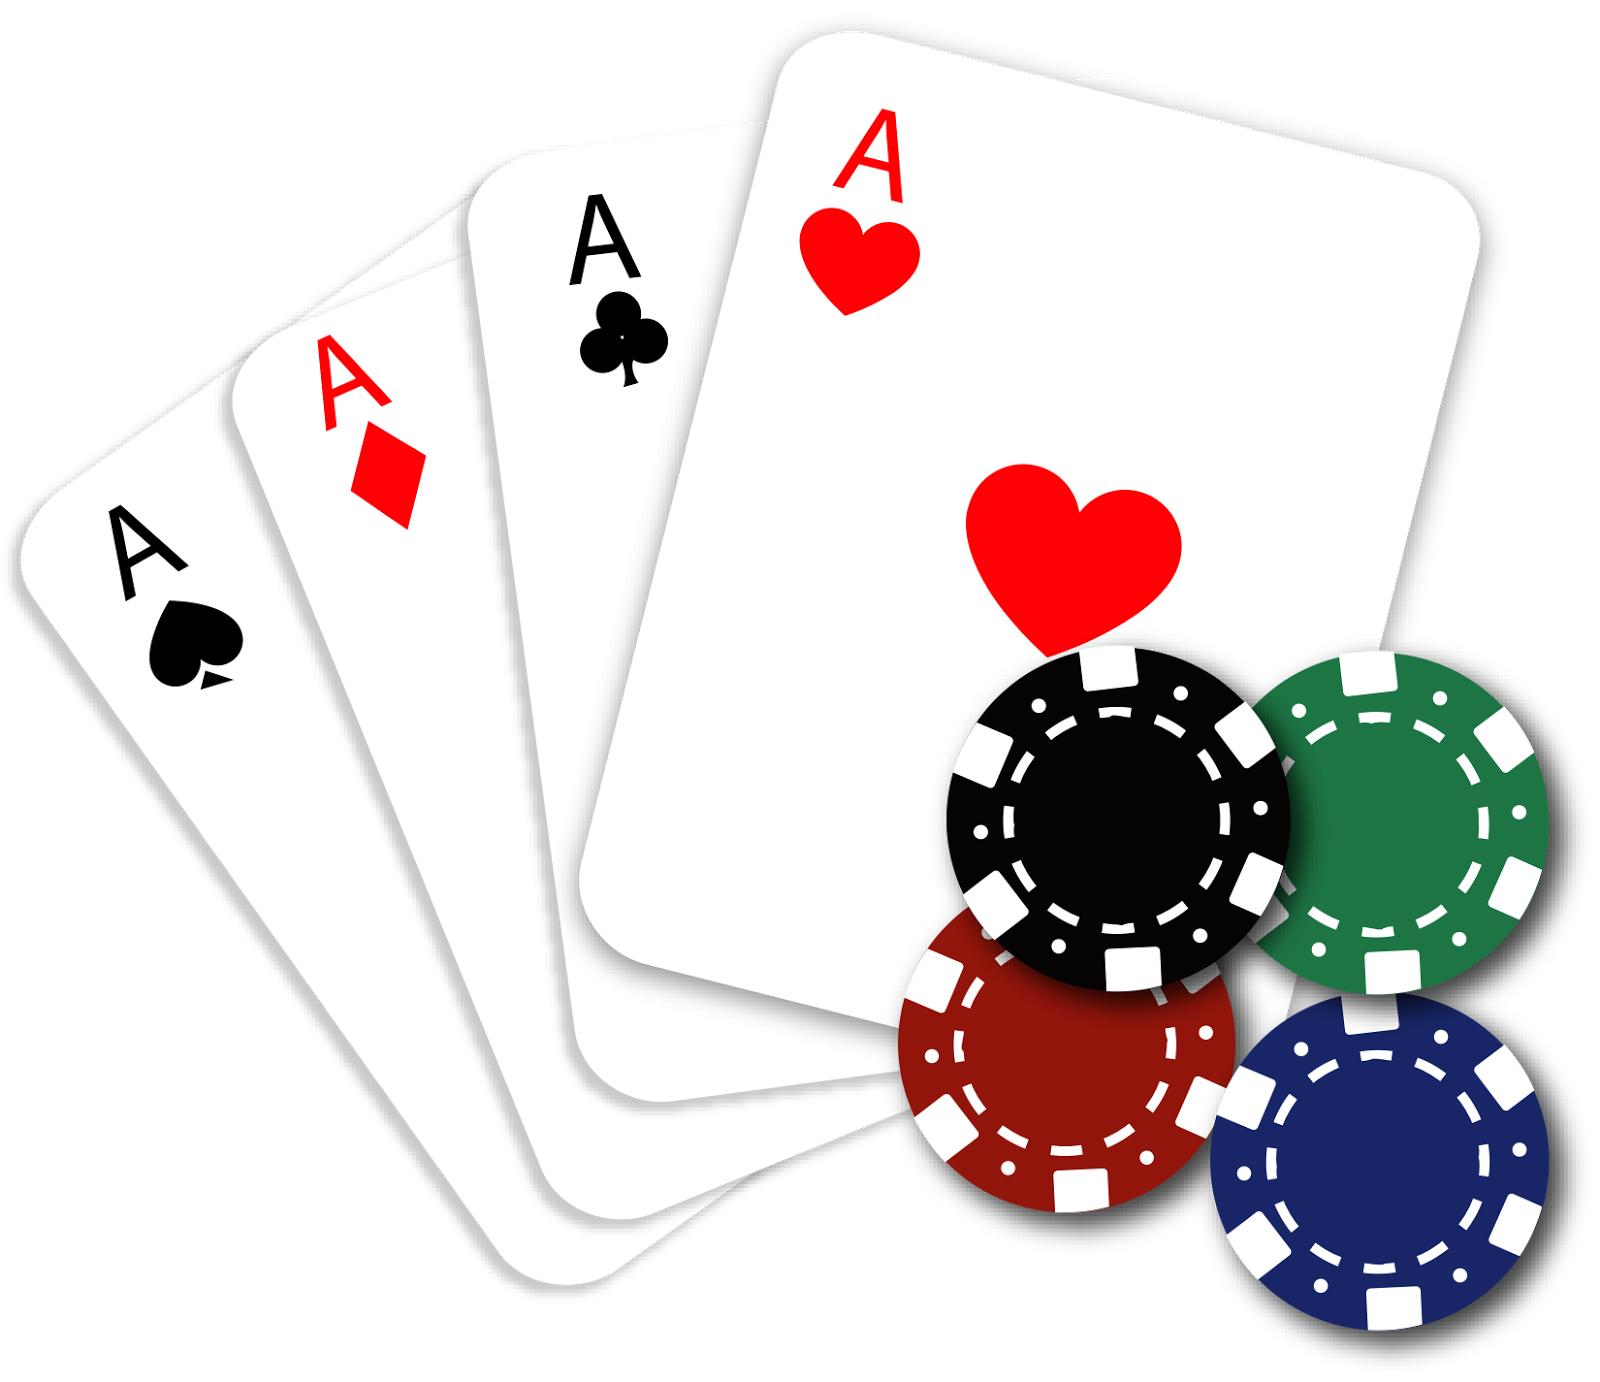 Faktor Menarik Memilih Agen Idn Poker Untuk Bertarung Menjanjikan